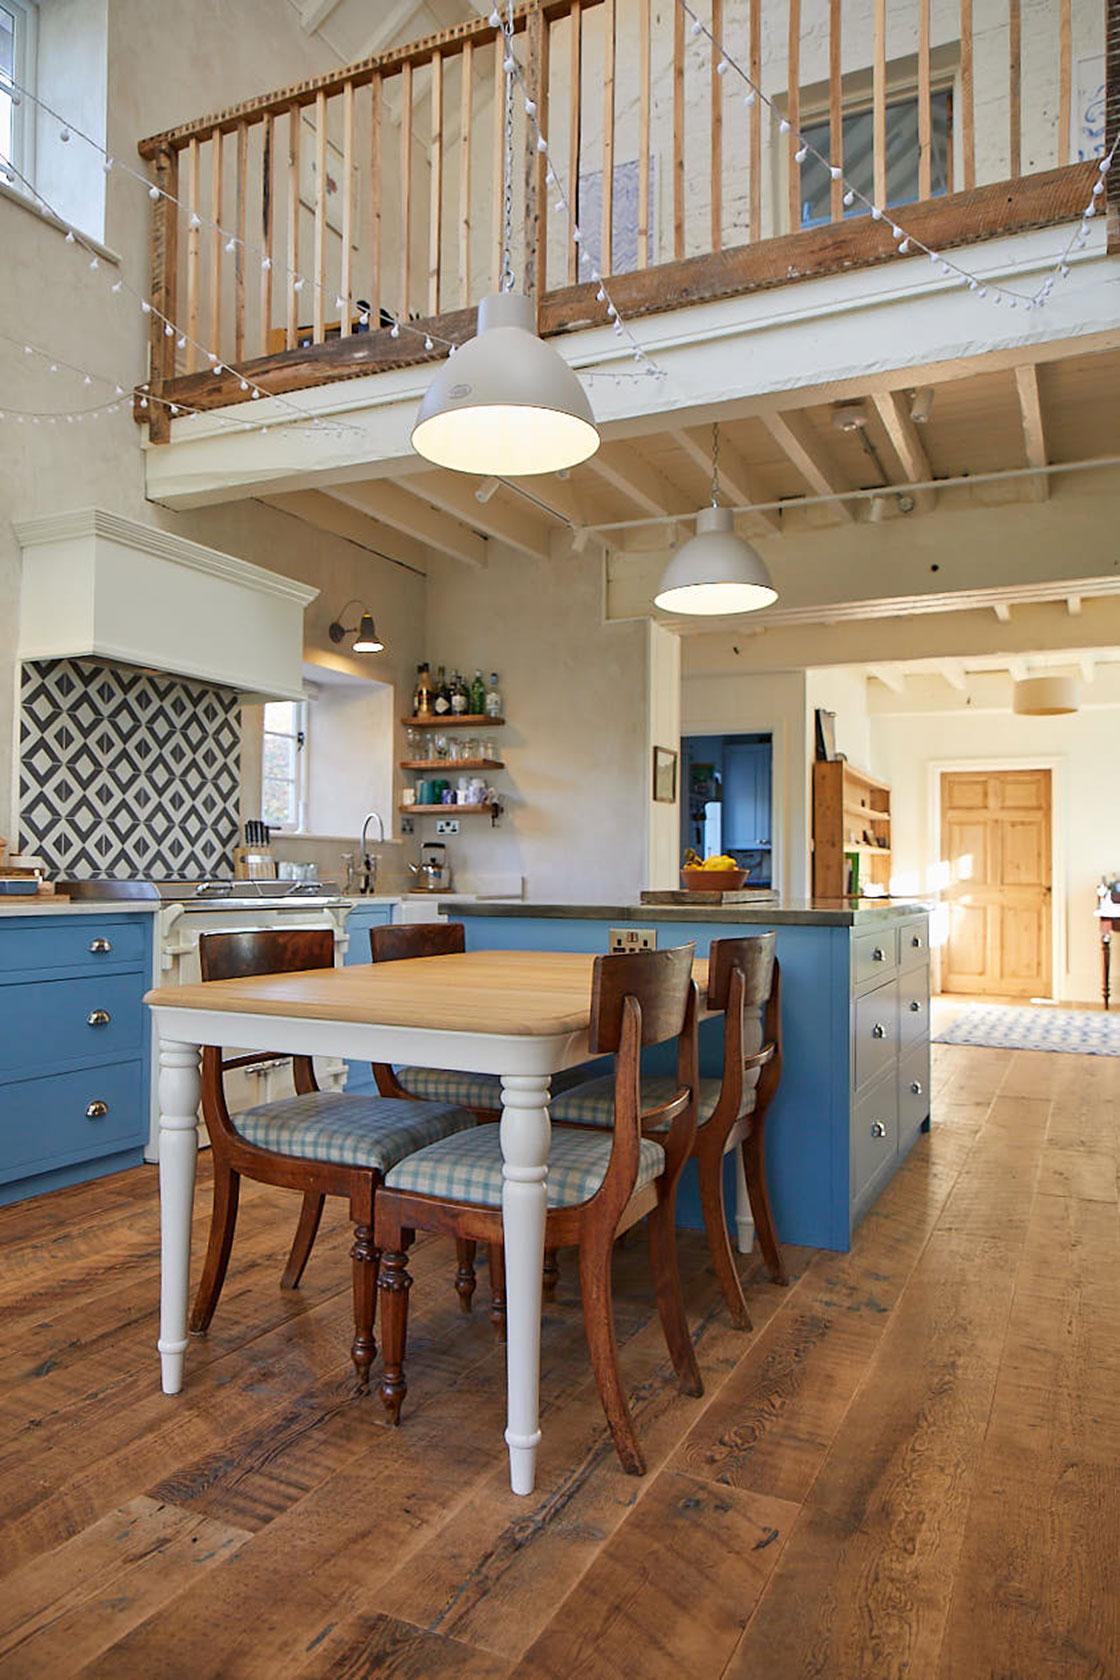 Painted farmhouse oak table next to light blue kitchen island